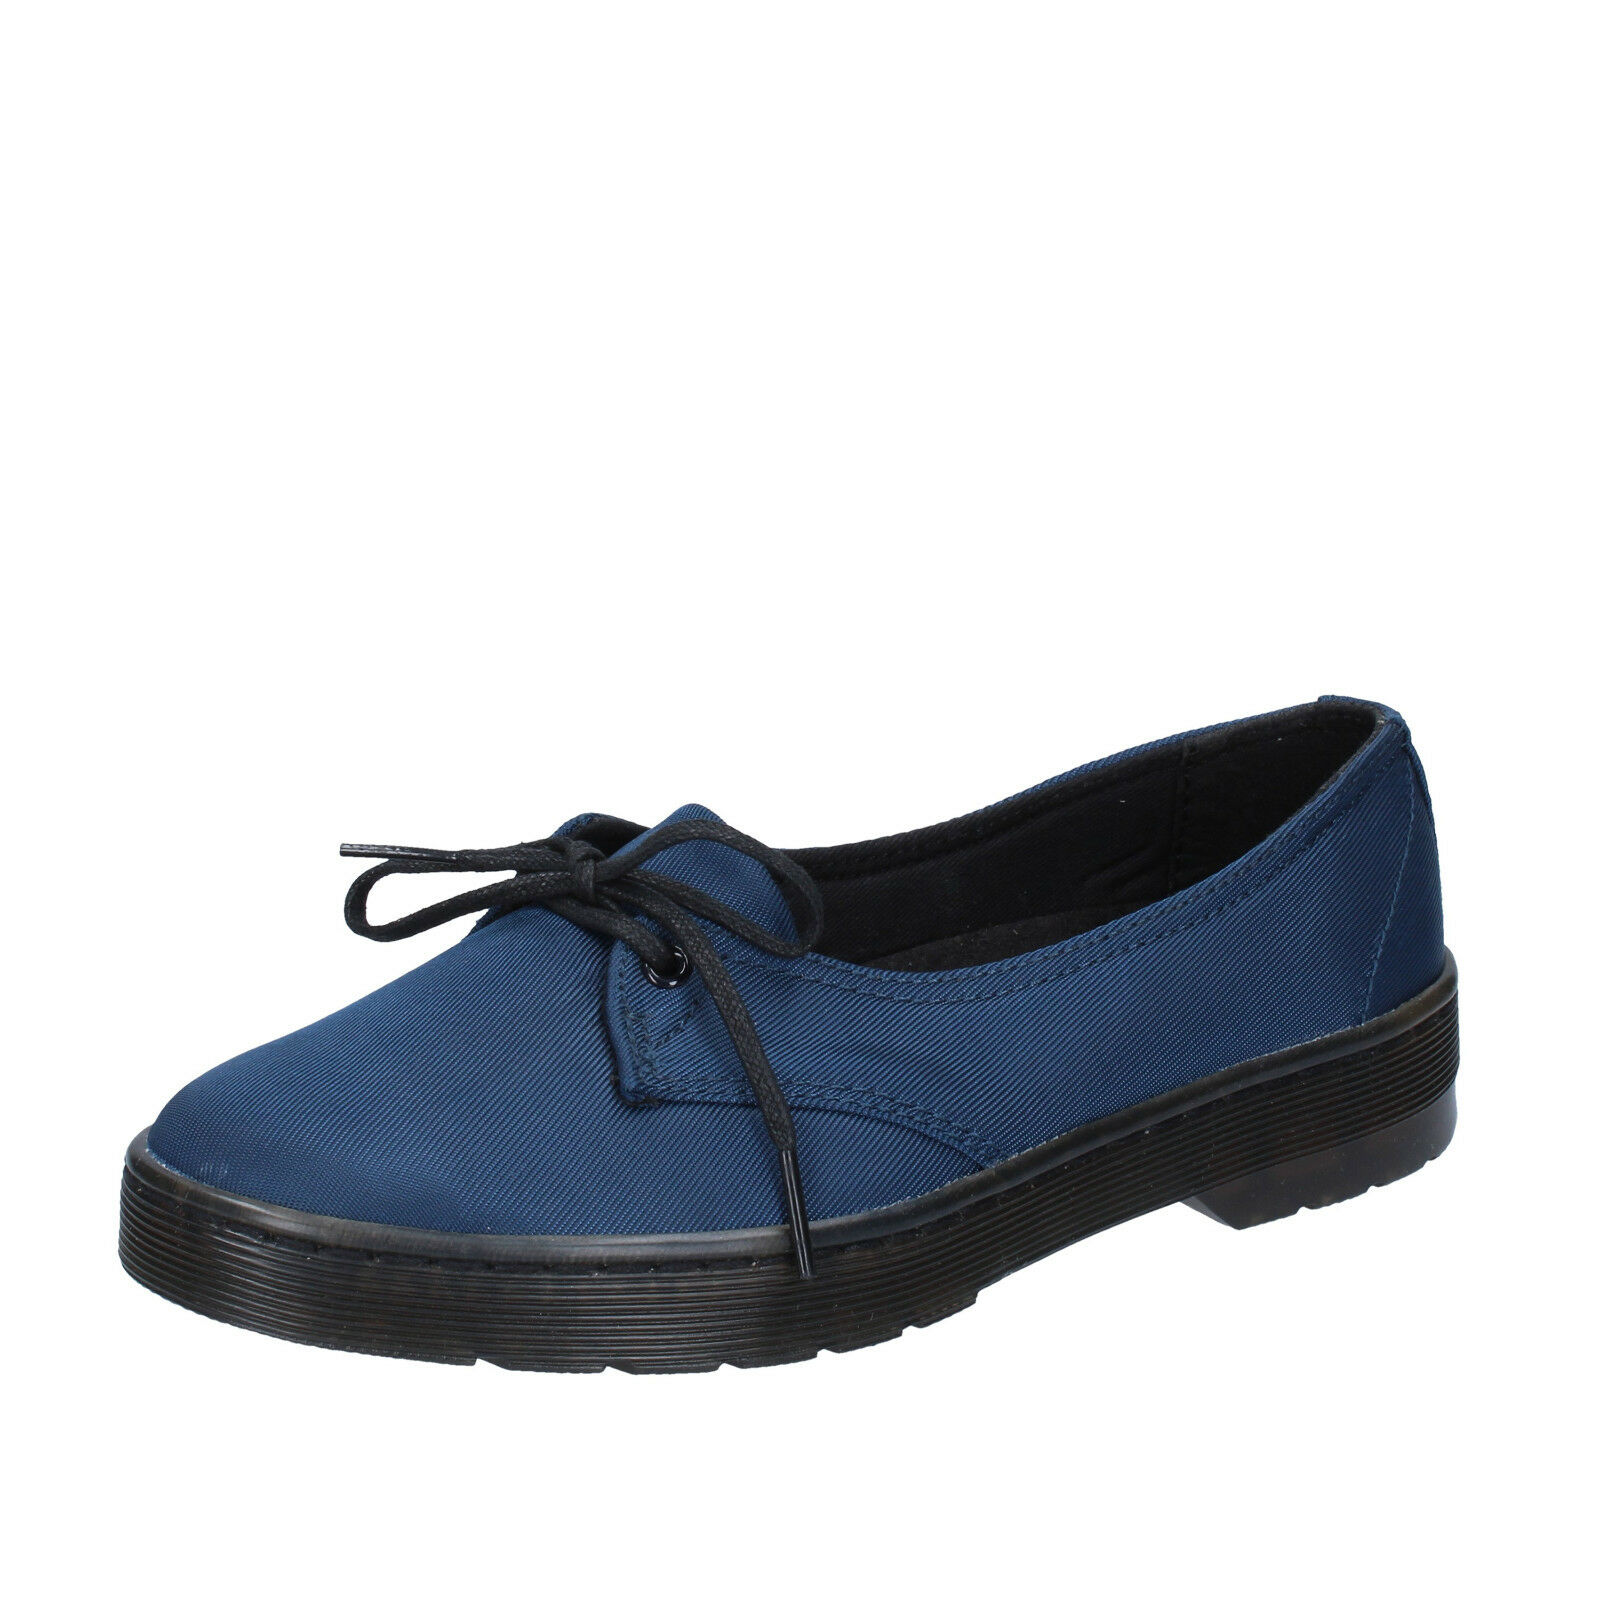 Para mujeres Zapatos Dr. Martens 3 (EU 36) Ballet Zapatos Zapatos Zapatos sin Taco Sin Lona Azul BT242-36  ahorra hasta un 50%